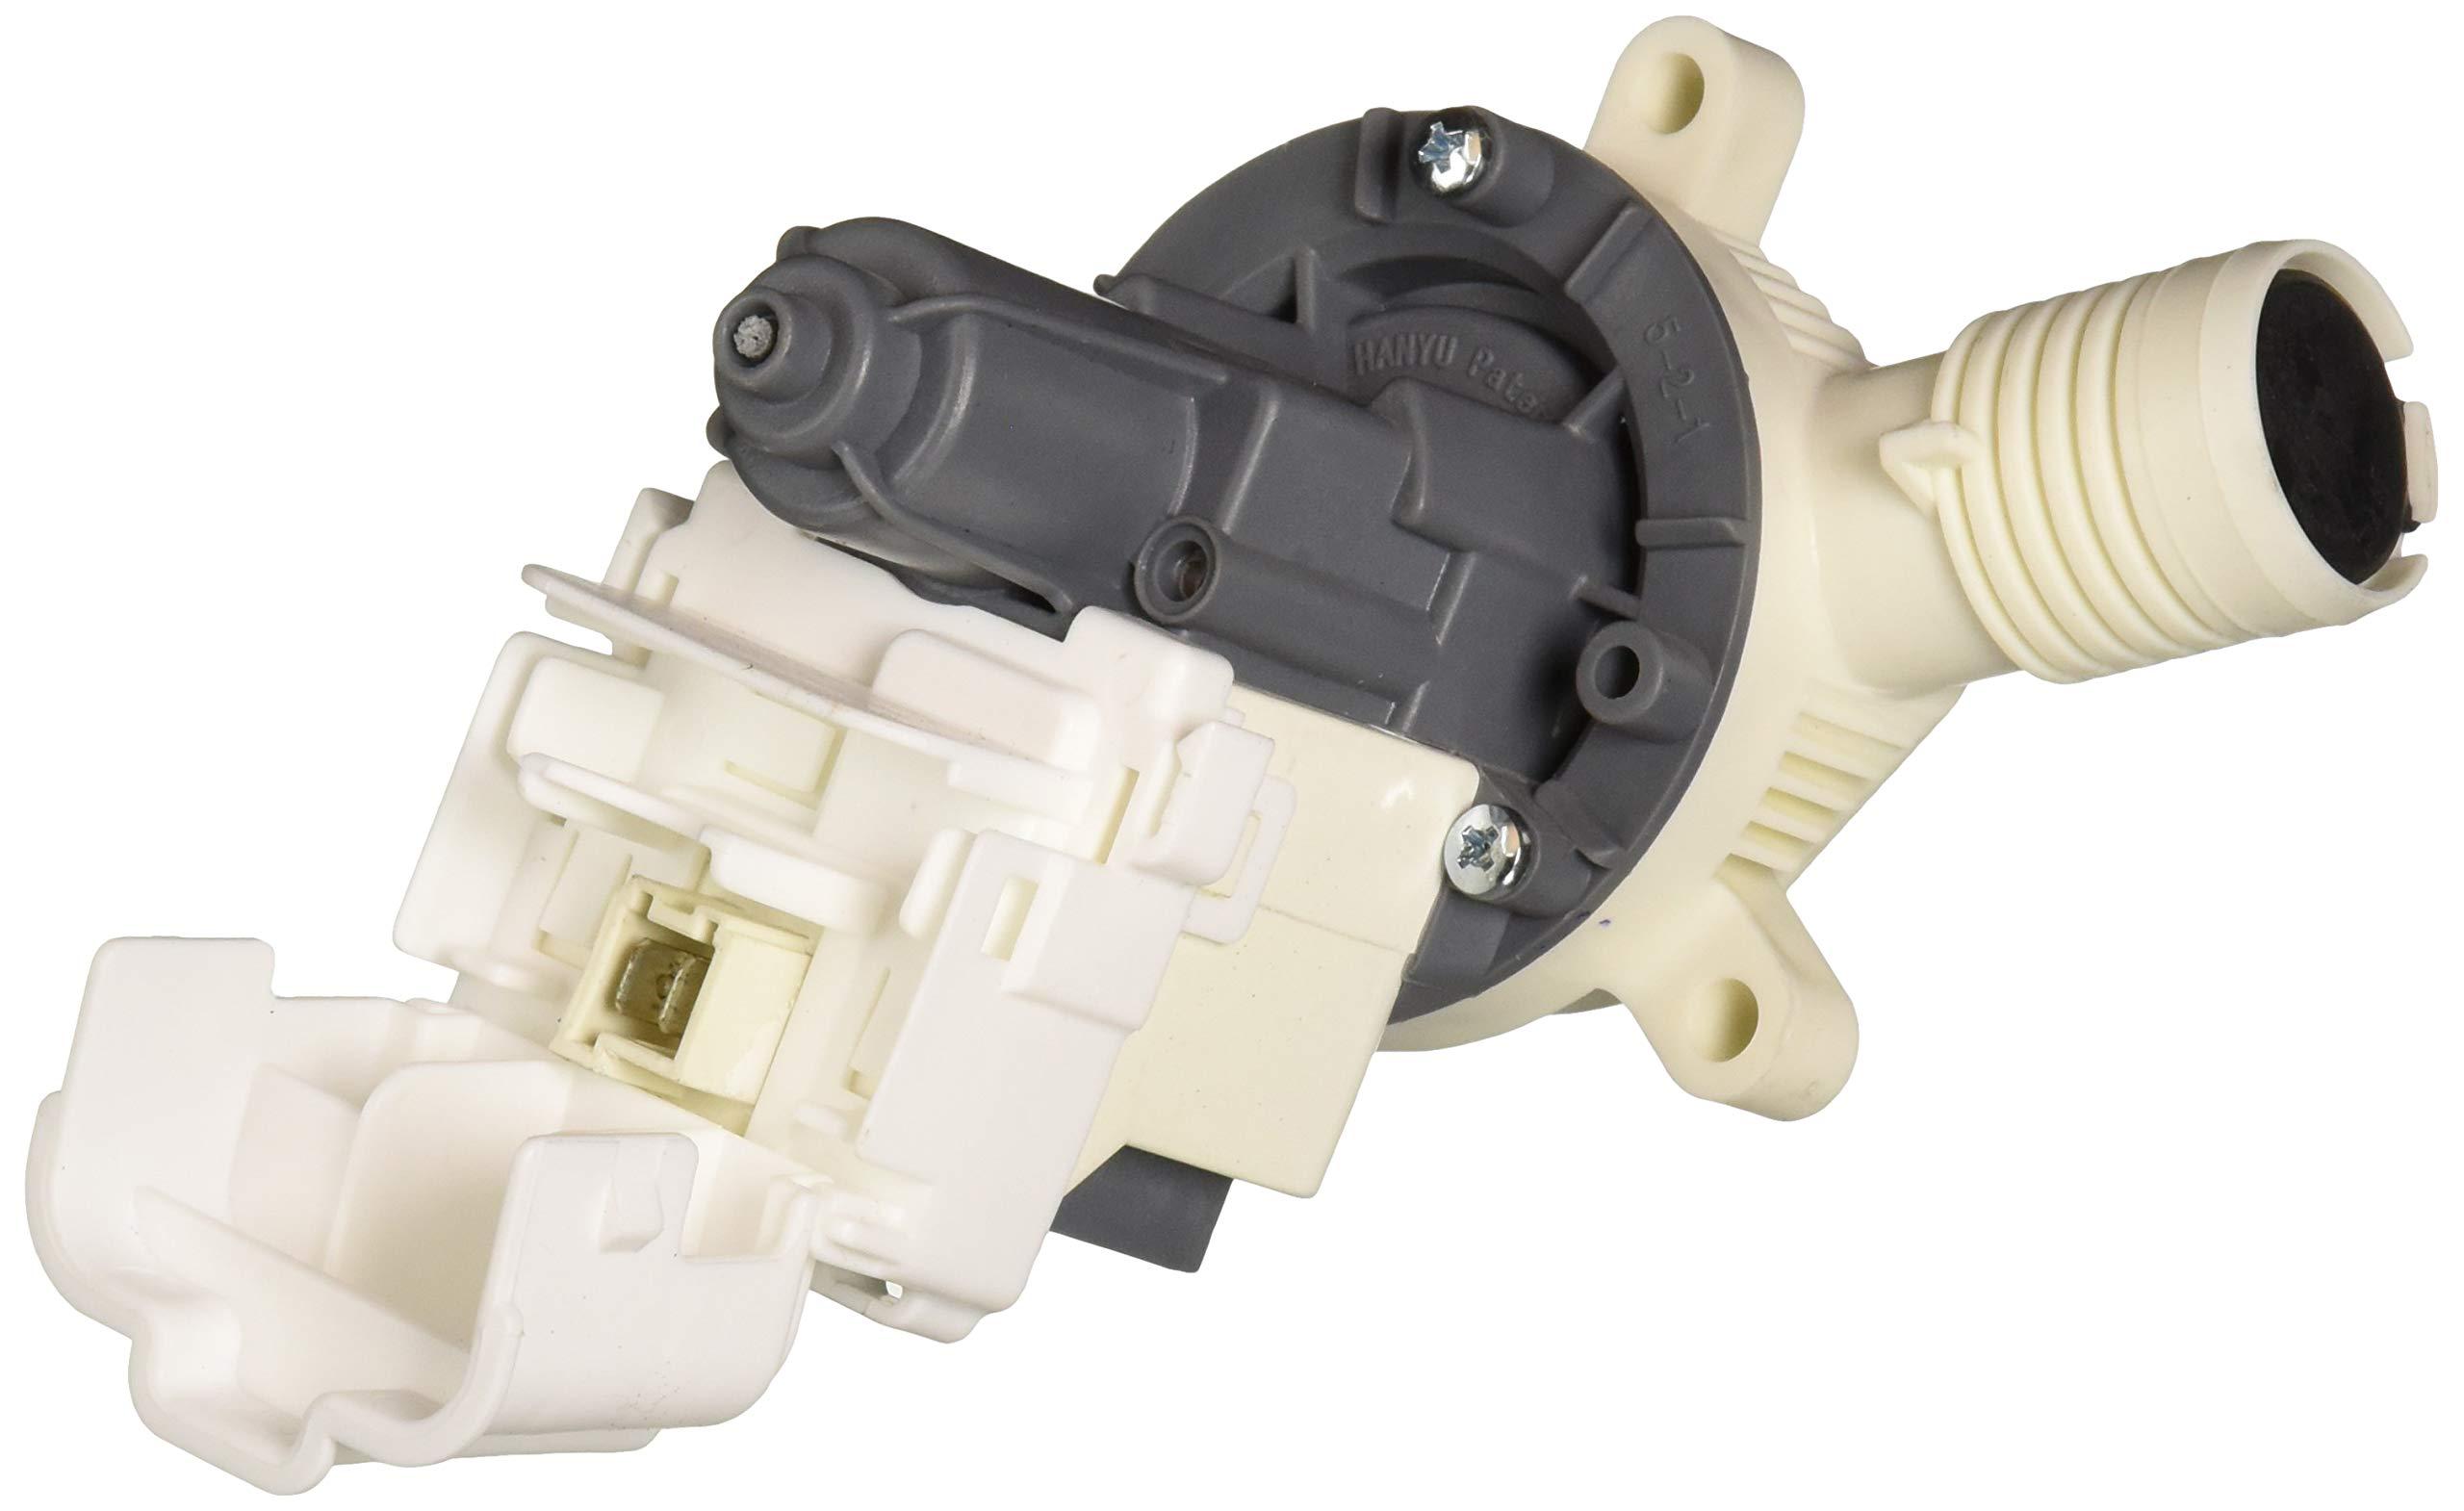 Whirlpool WPW10661045 Drain Pump, White